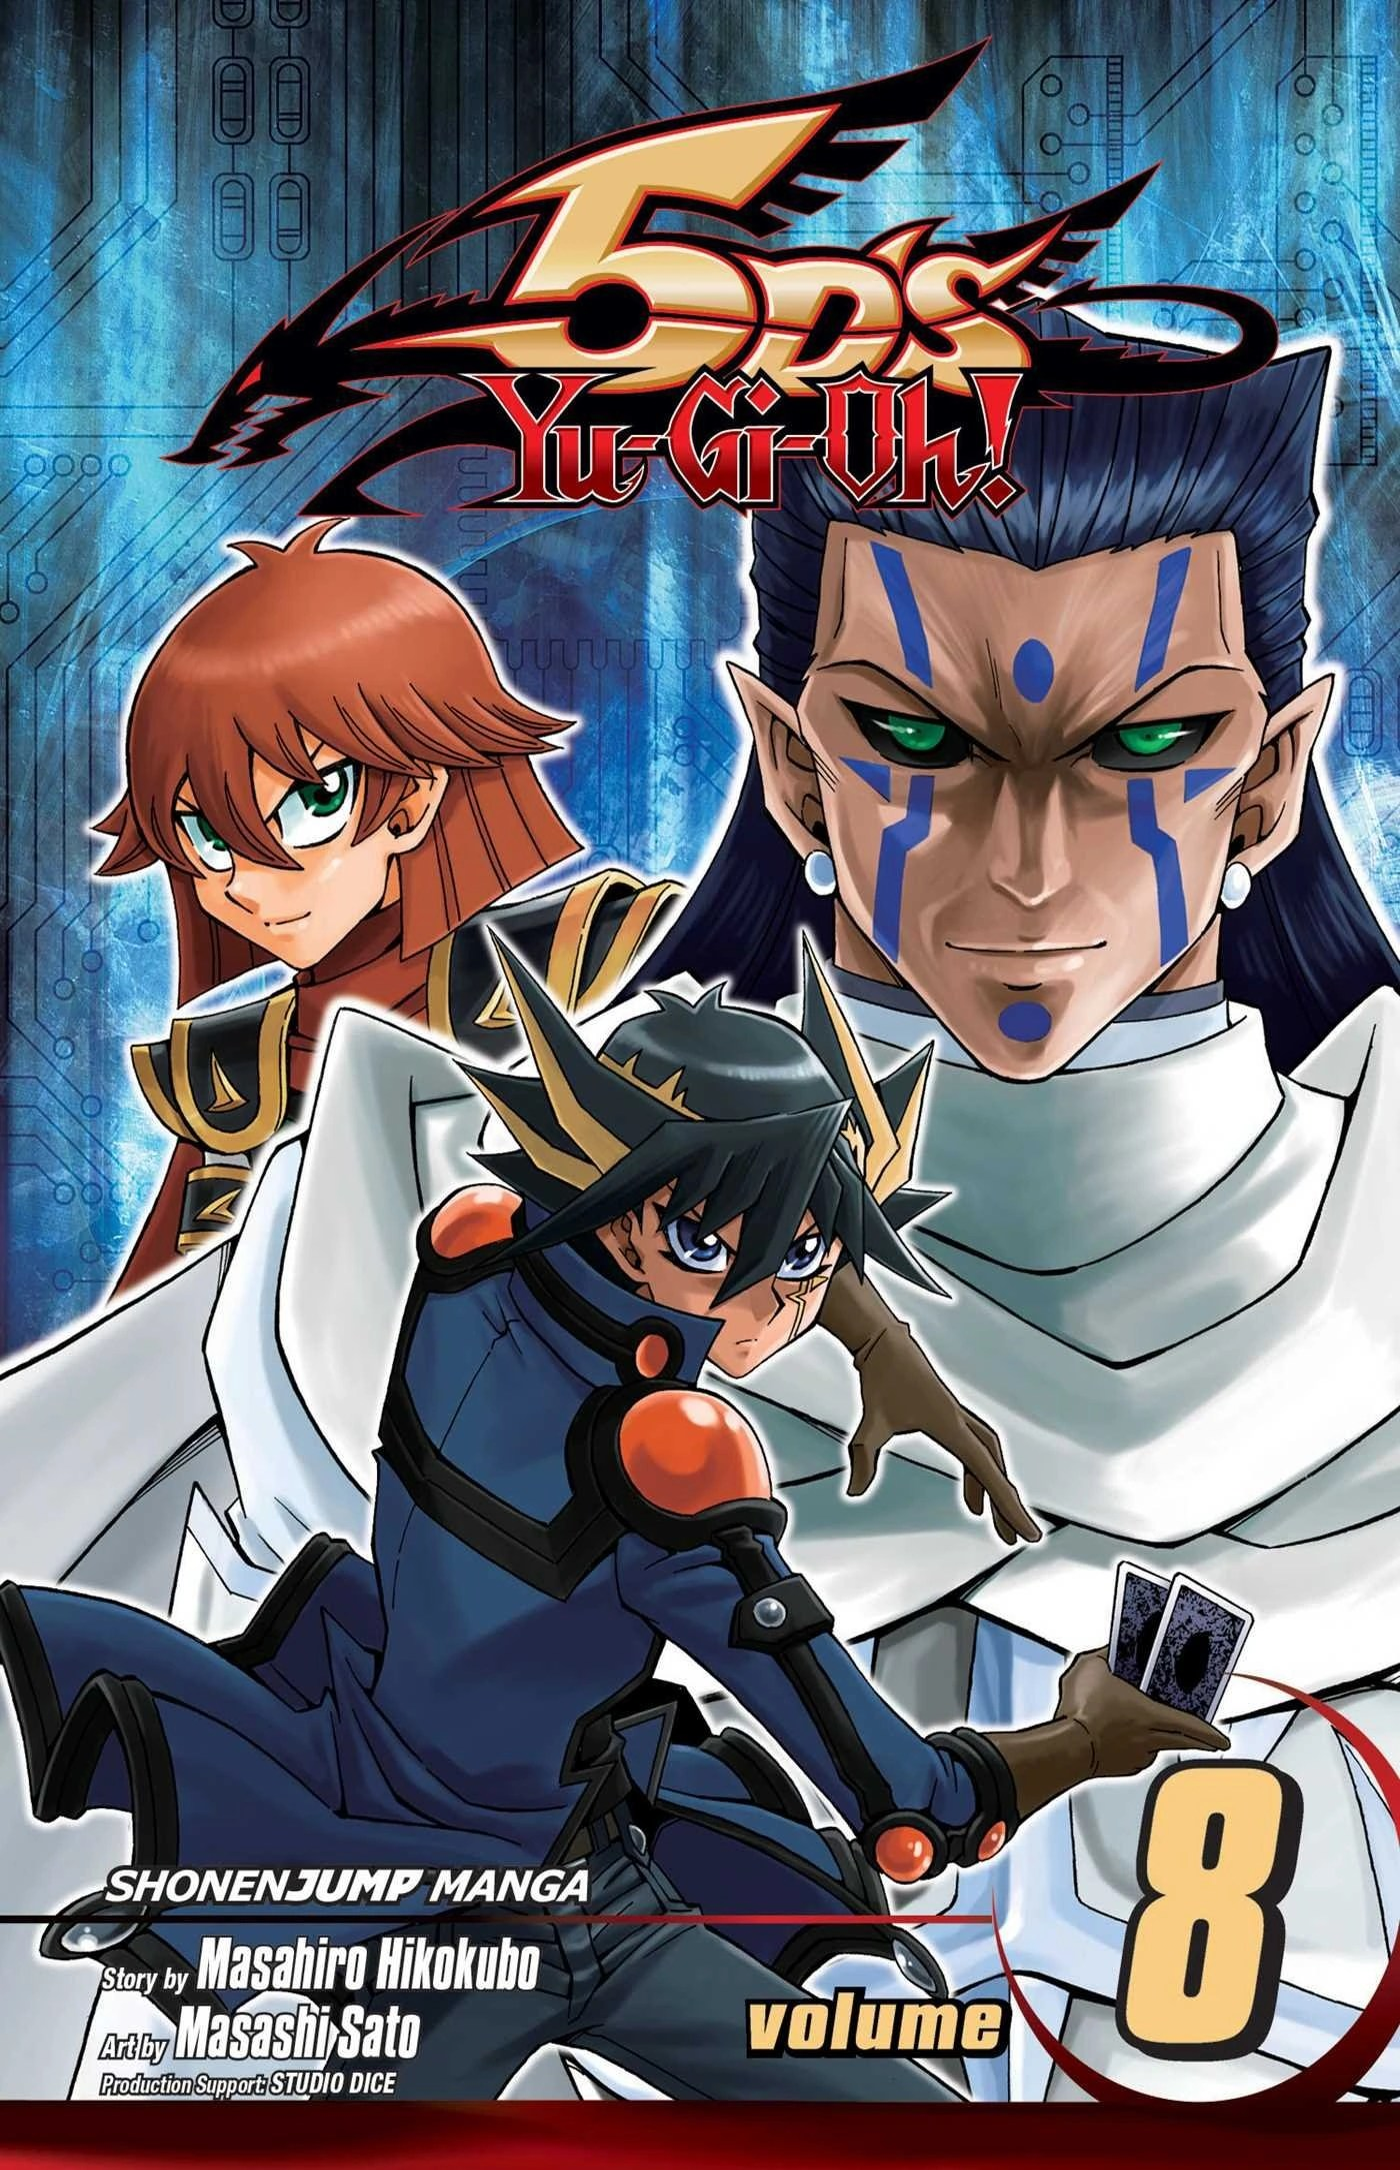 Yu Gi Oh 5ds : Yu-Gi-Oh!, Volume, Promotional, Fandom